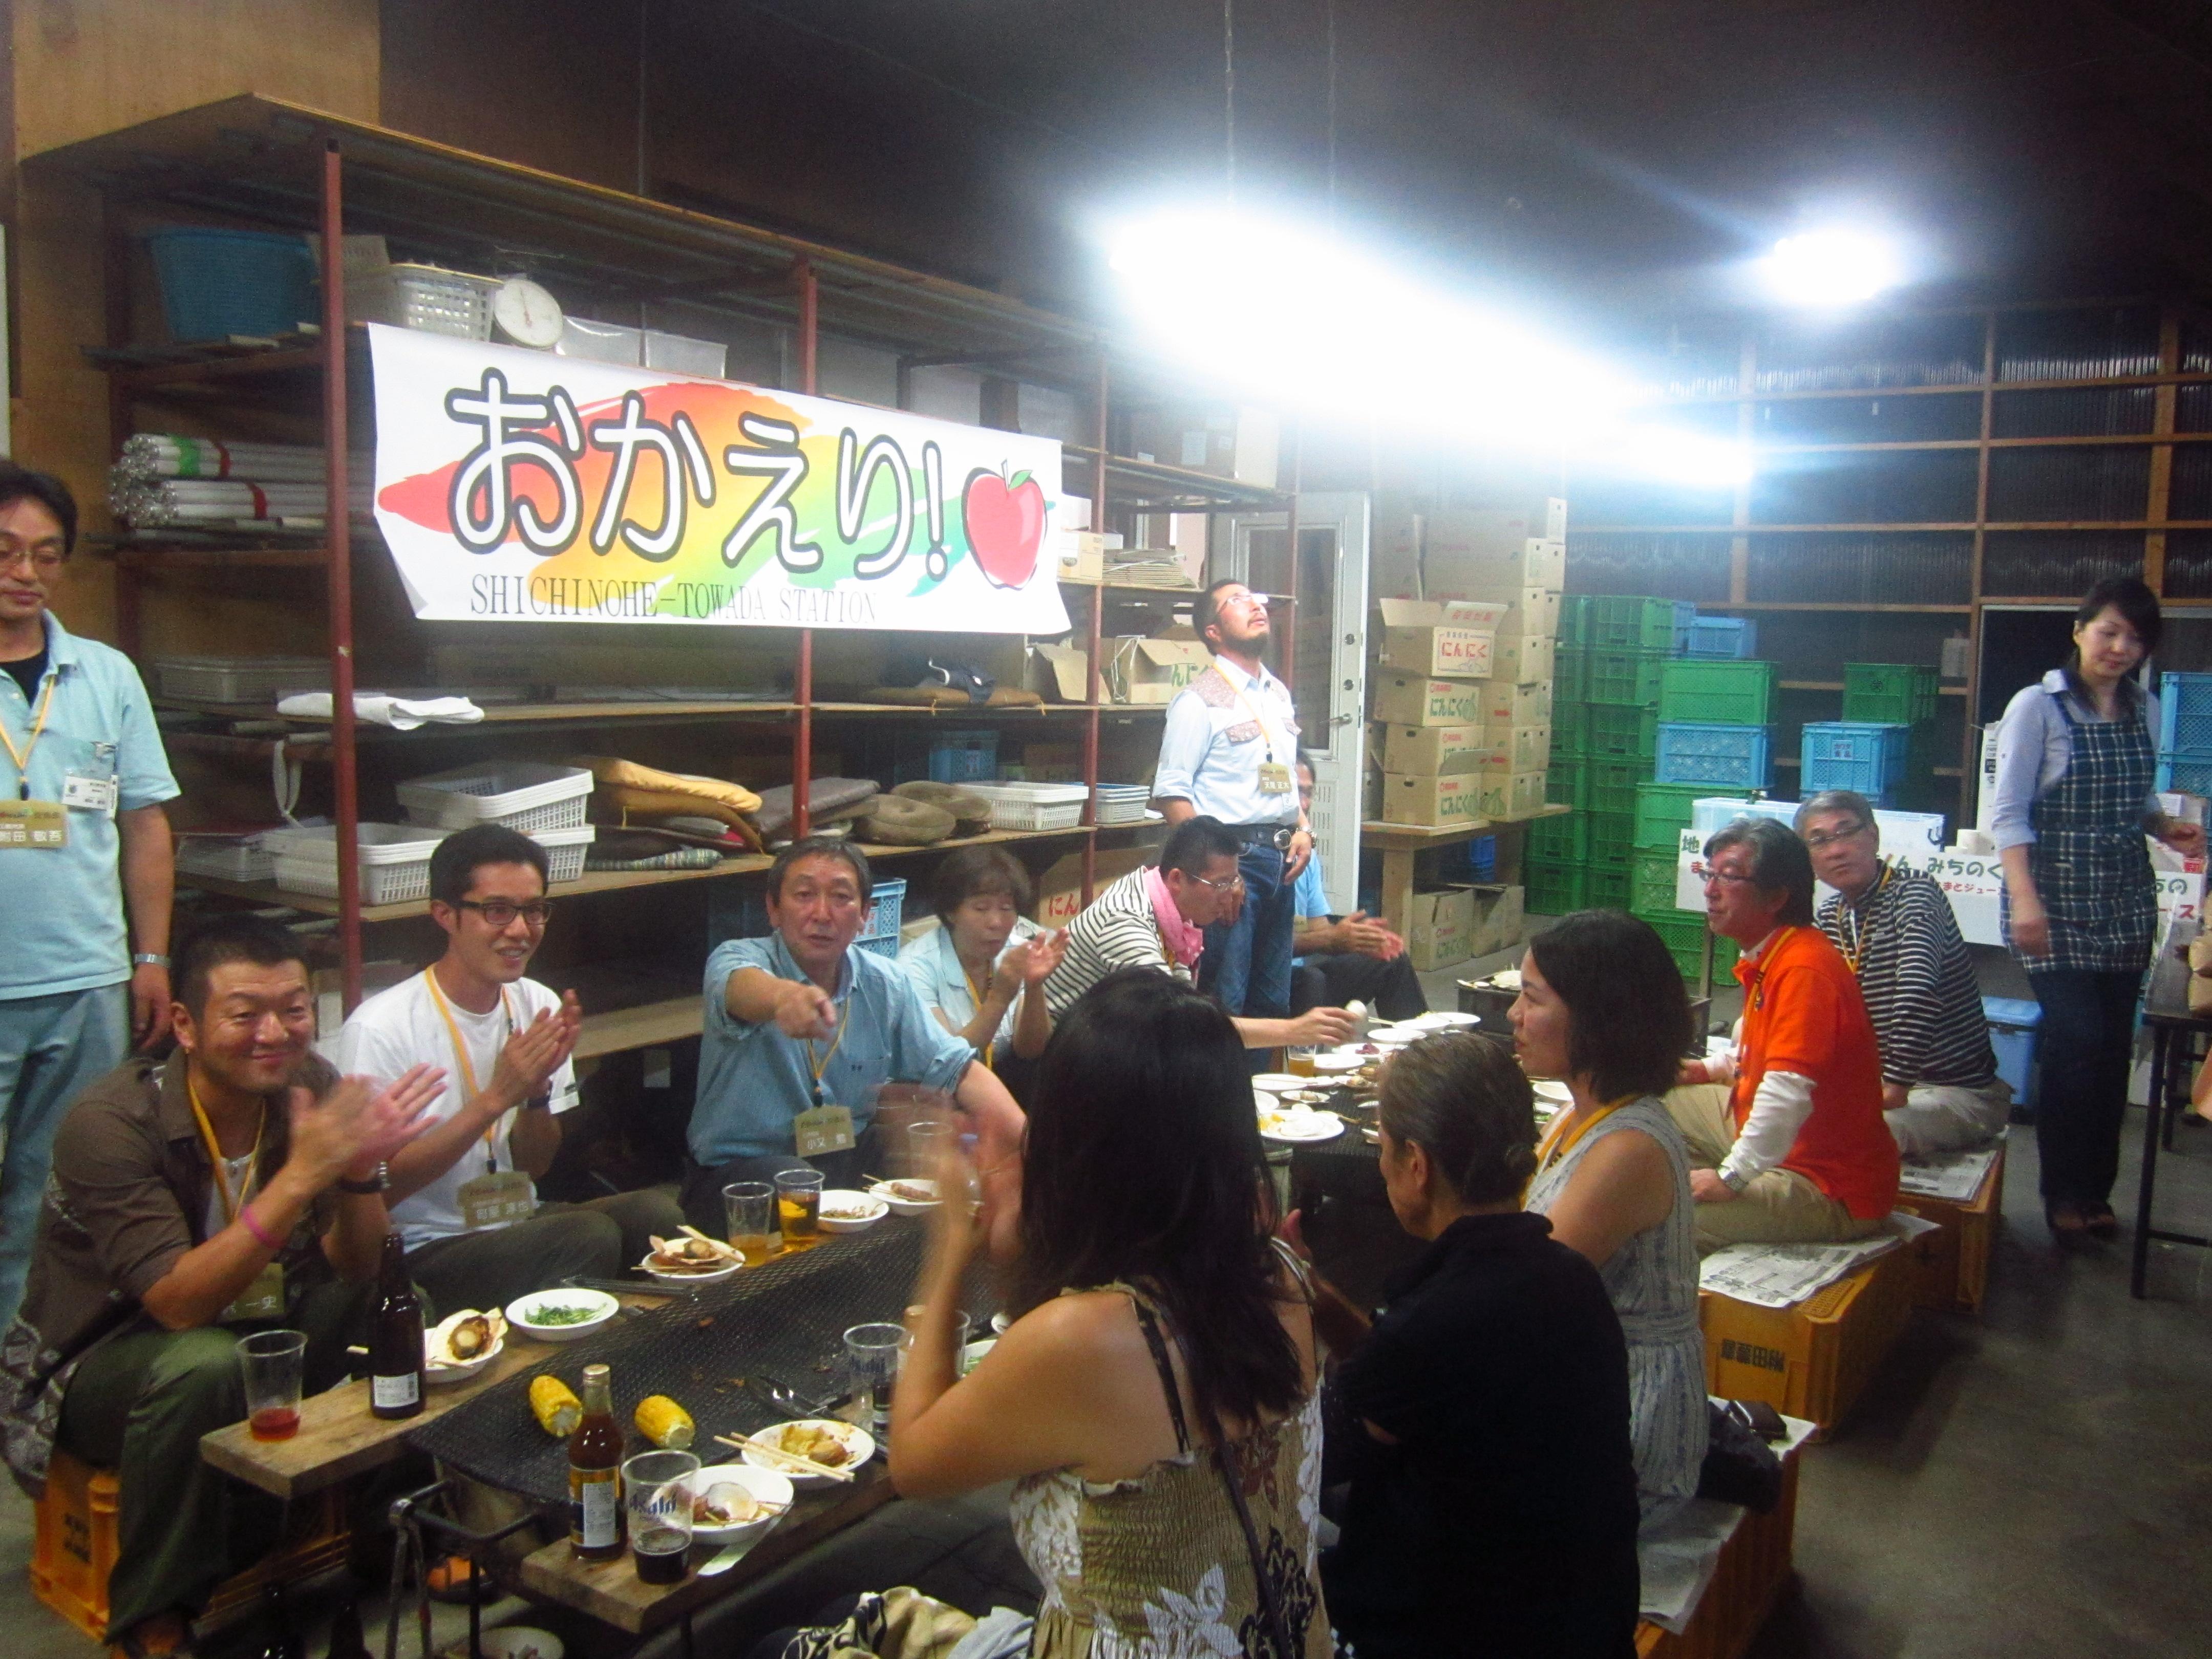 IMG 4328 - 麻布十番納涼祭り25,26日(七戸町出店)